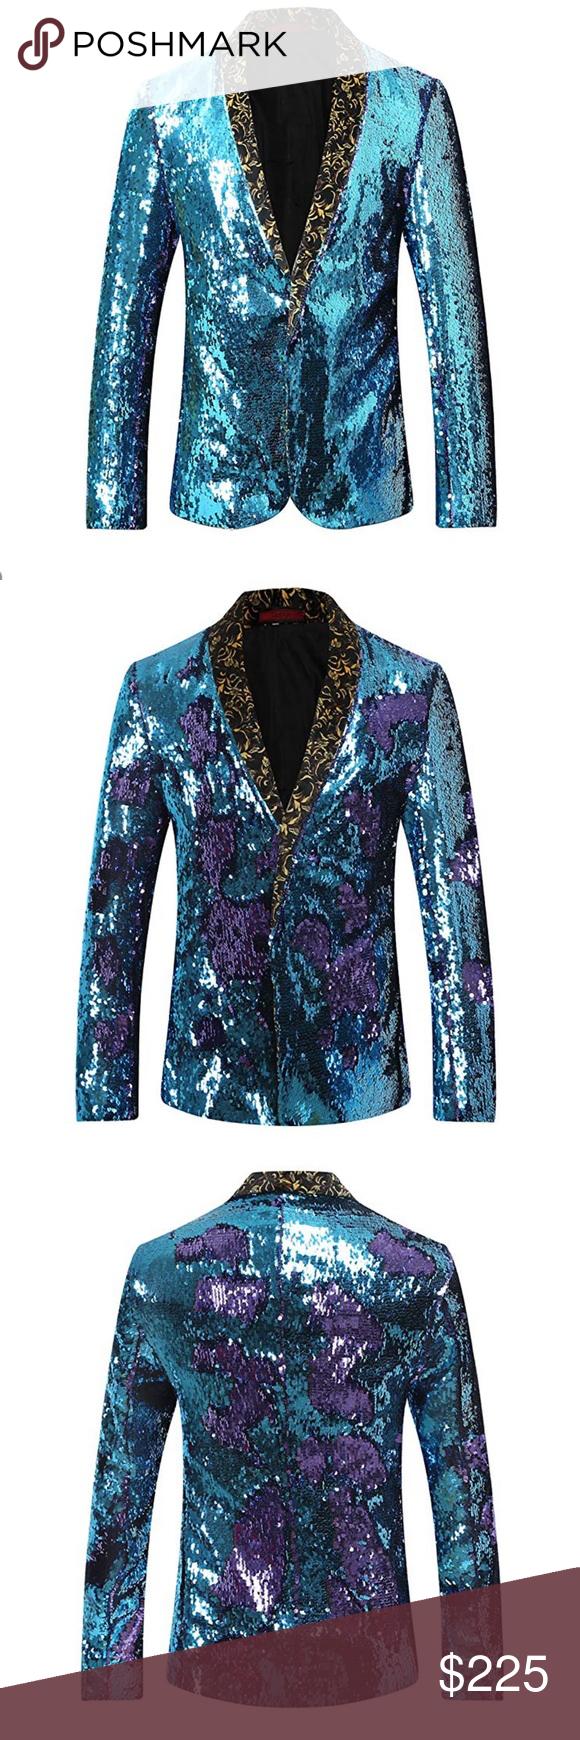 4af778b2 Elton John Style Sequined Jacket Life is a party 23786555 Men's Sport Coat  Slim Fit Shawl